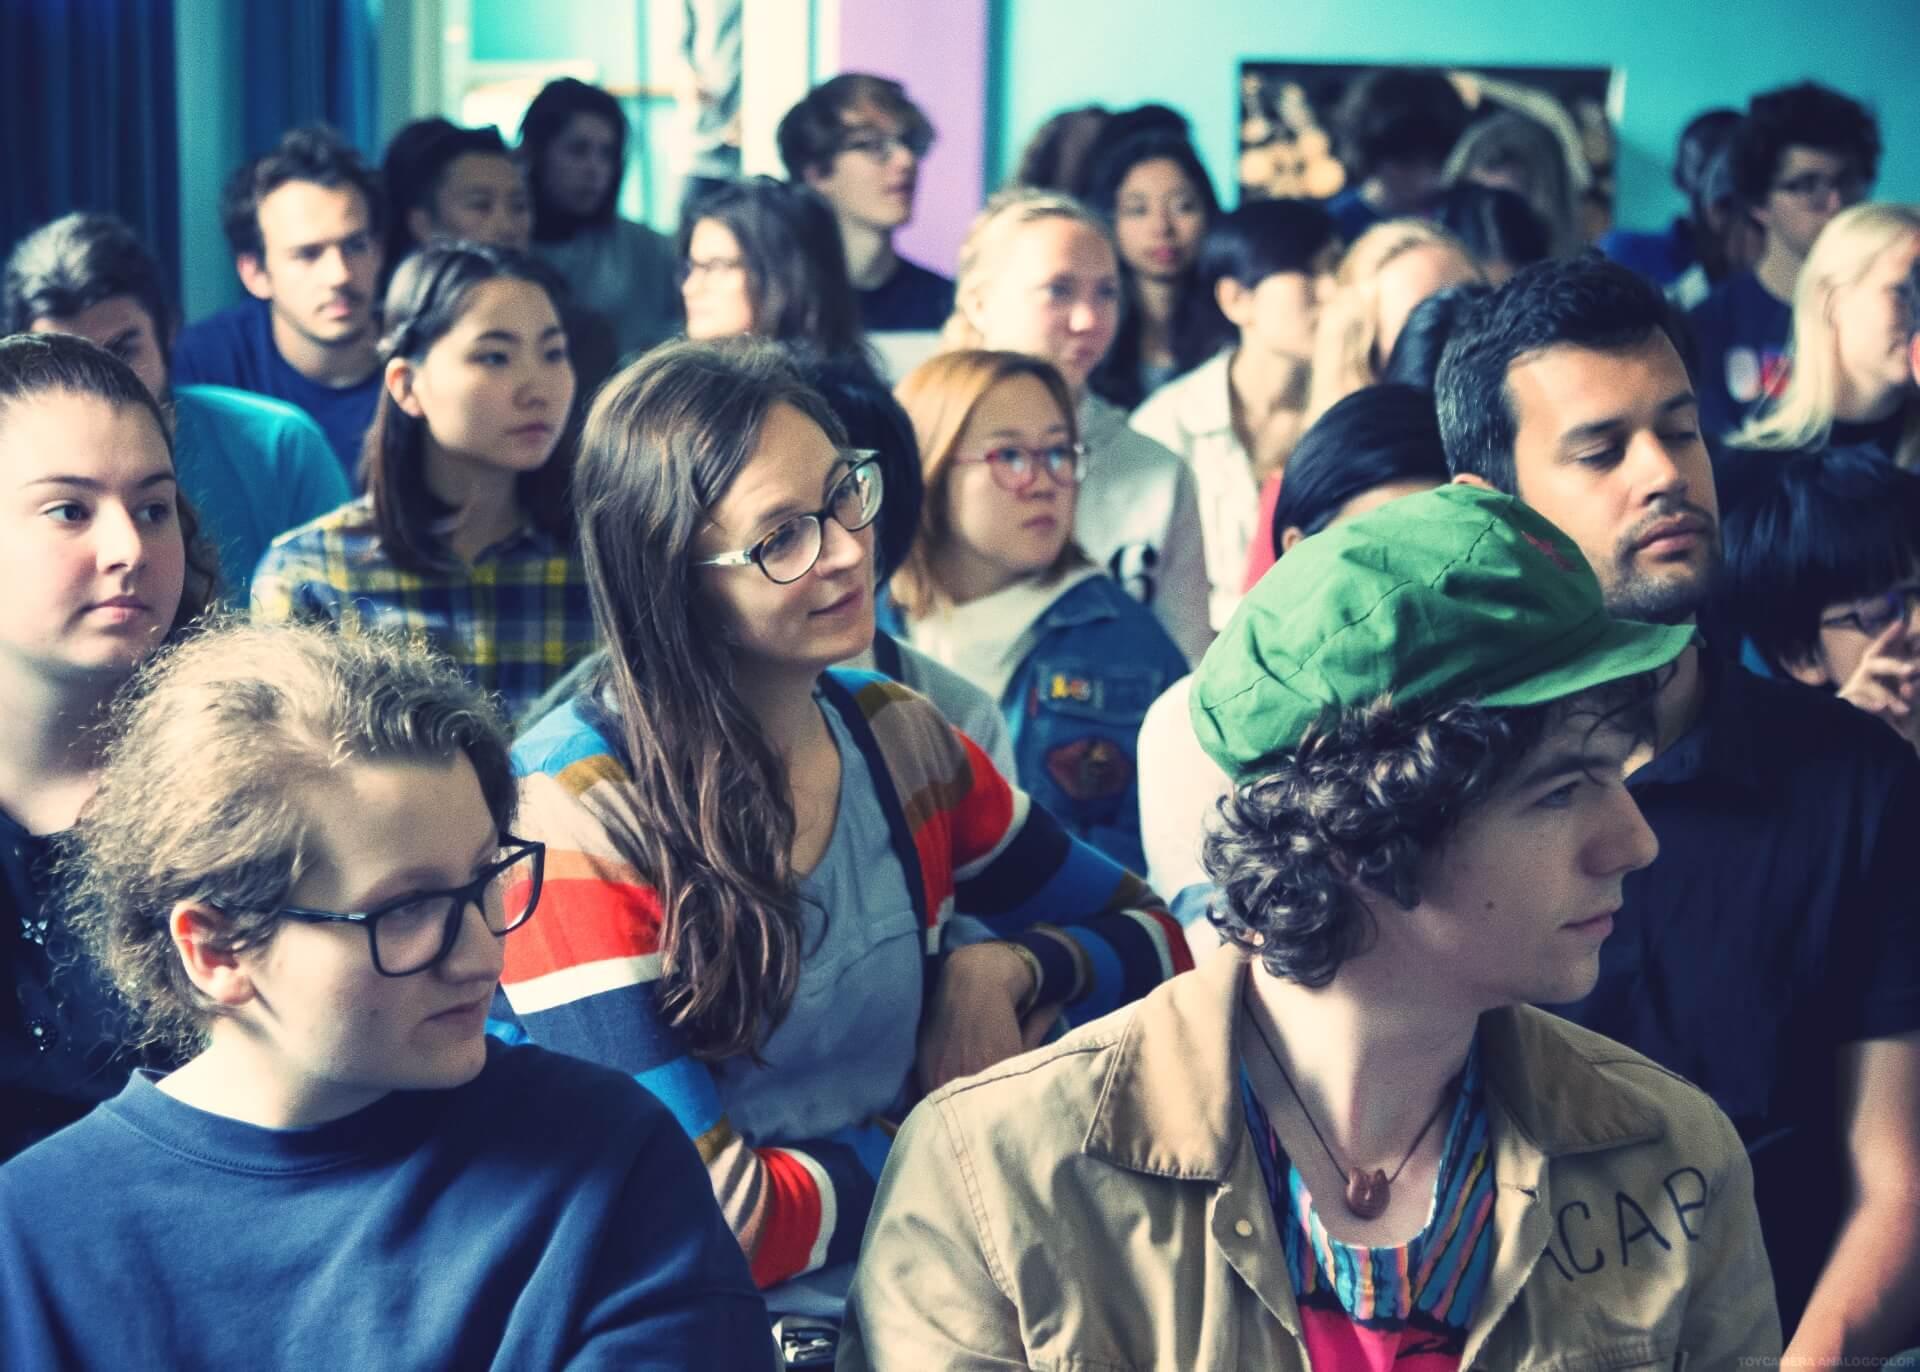 IPC - Morning Fellowship at International People's College - An International Folk High School in Denmark